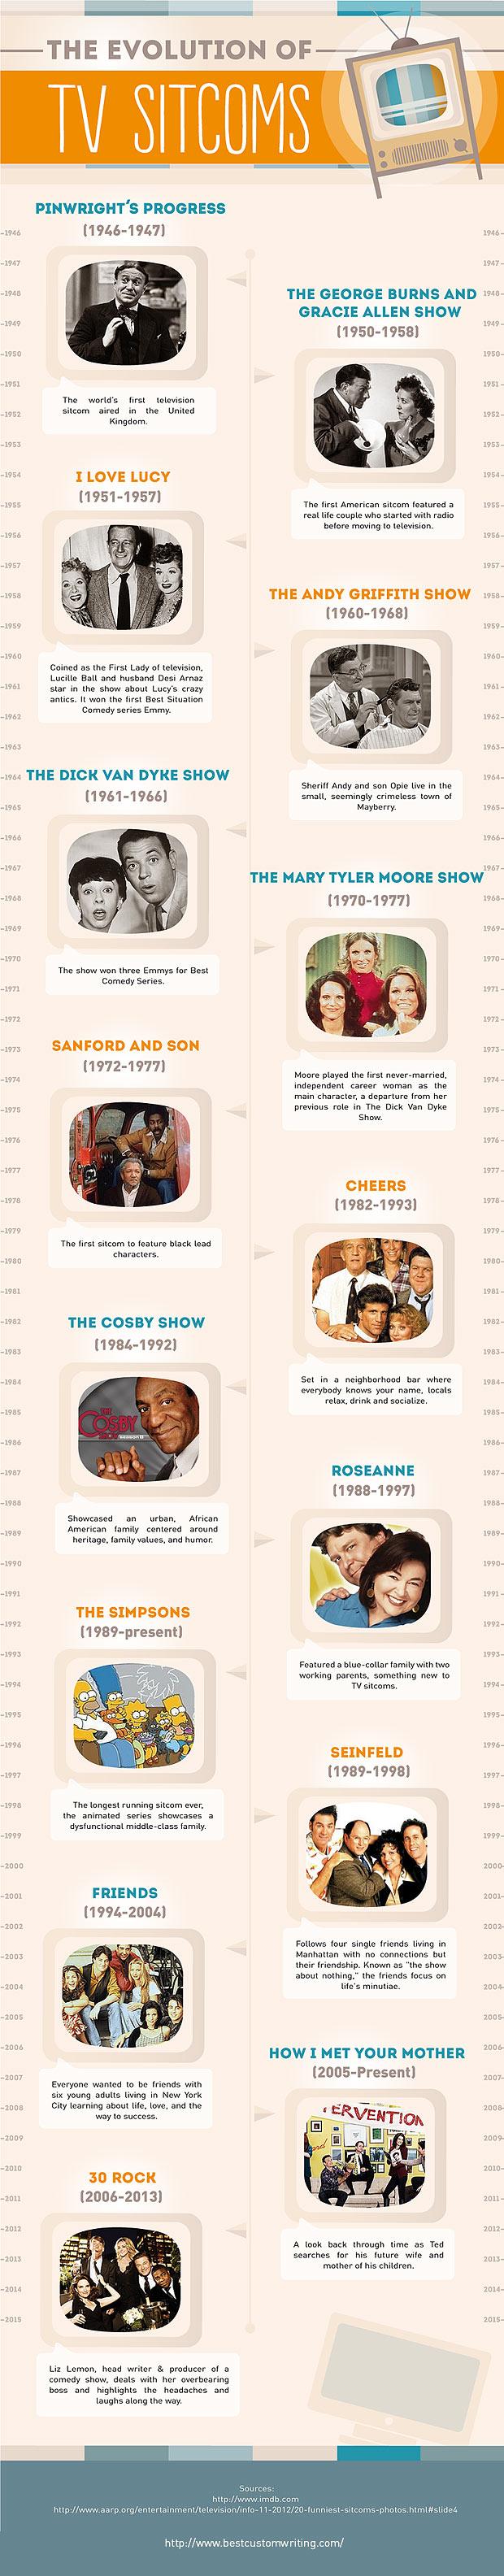 1evolution-of-tv-sitcoms